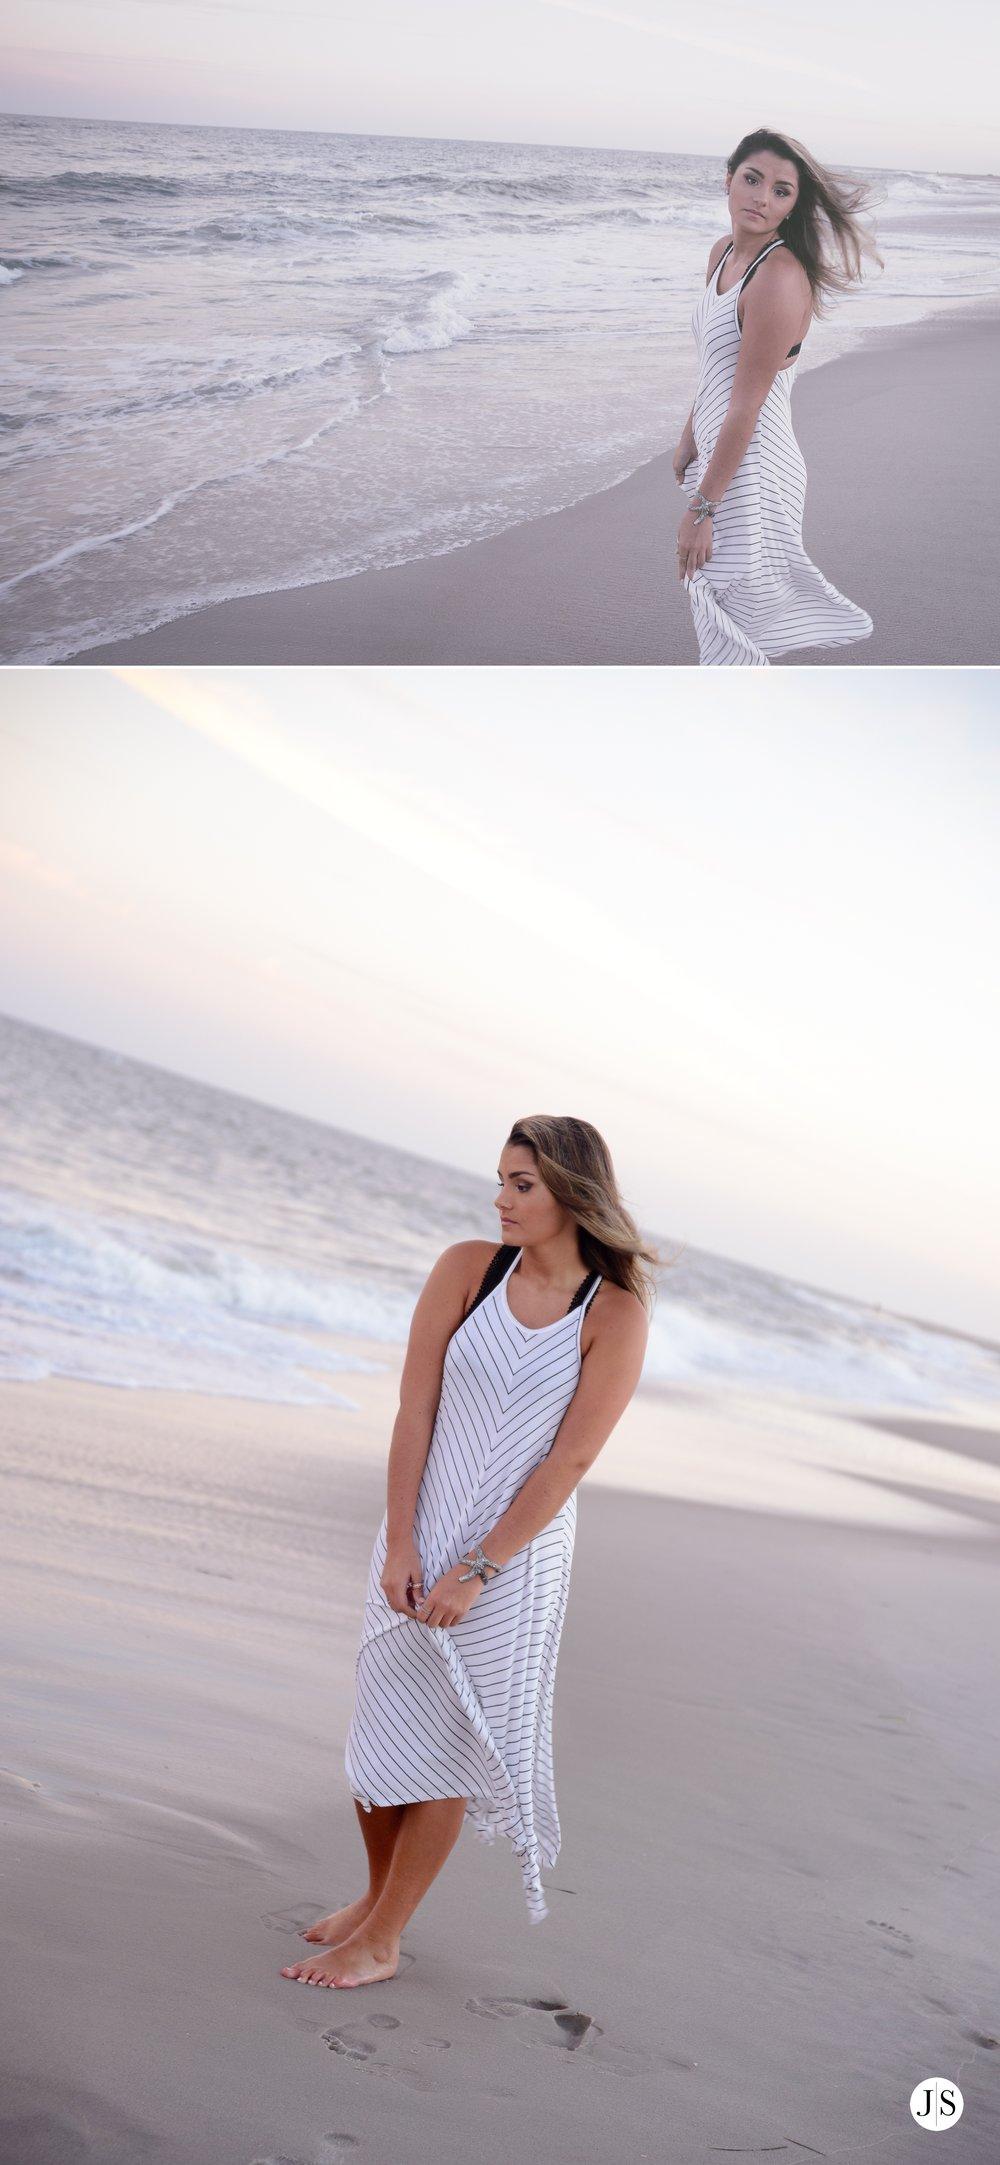 senior-portraits-beach-sunset-salisbury-assateague-maryland-photo 13.jpg